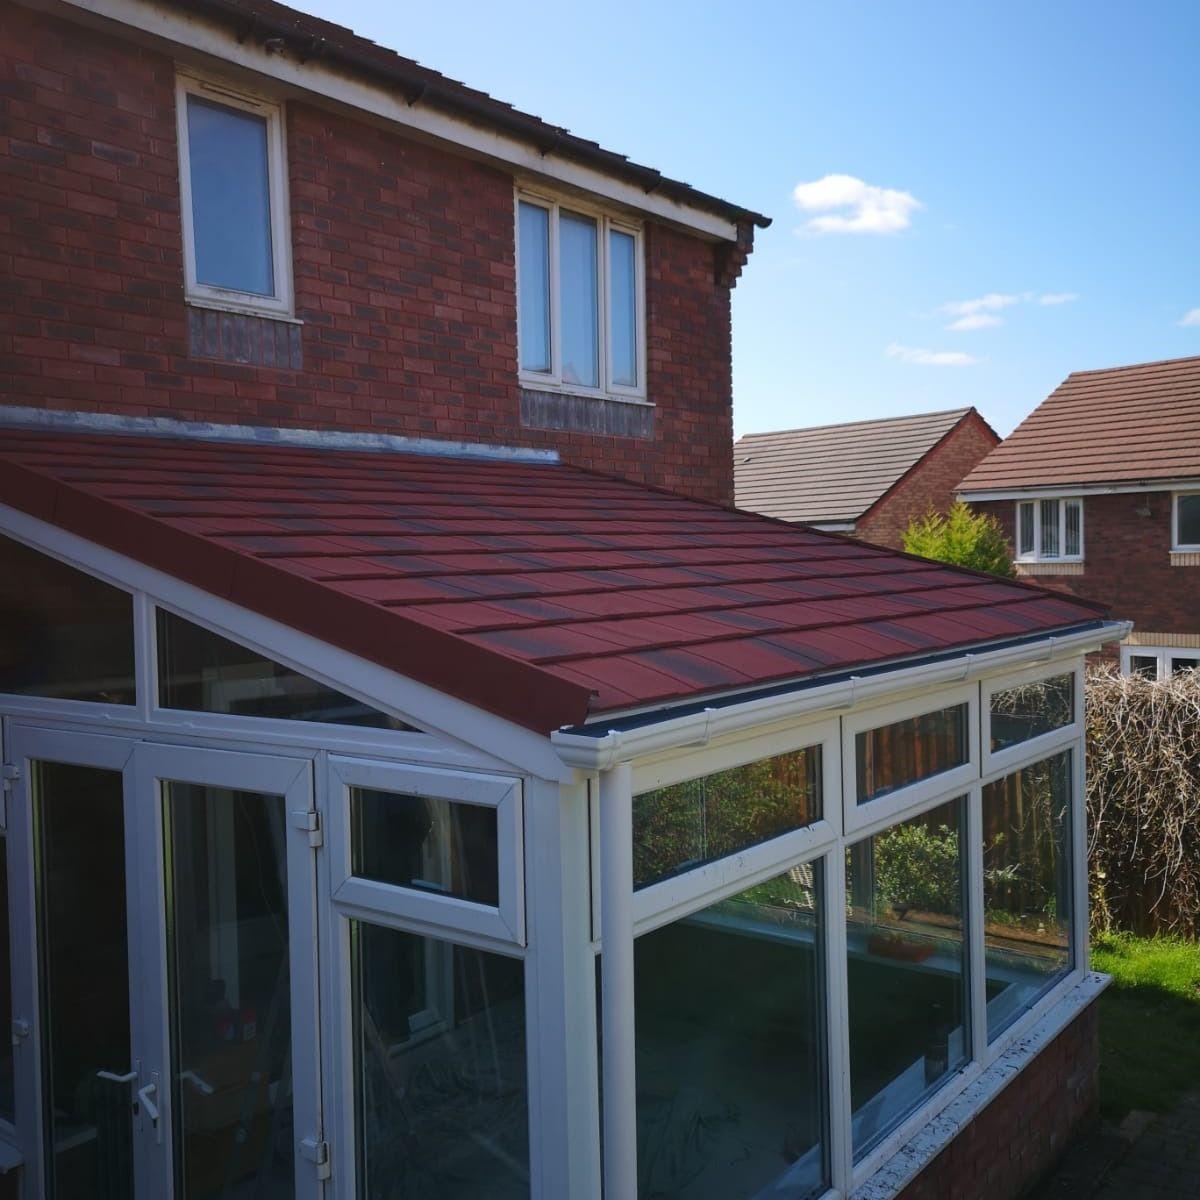 Leka Warm Roof Warm Roof Double Glazing Glass Roof